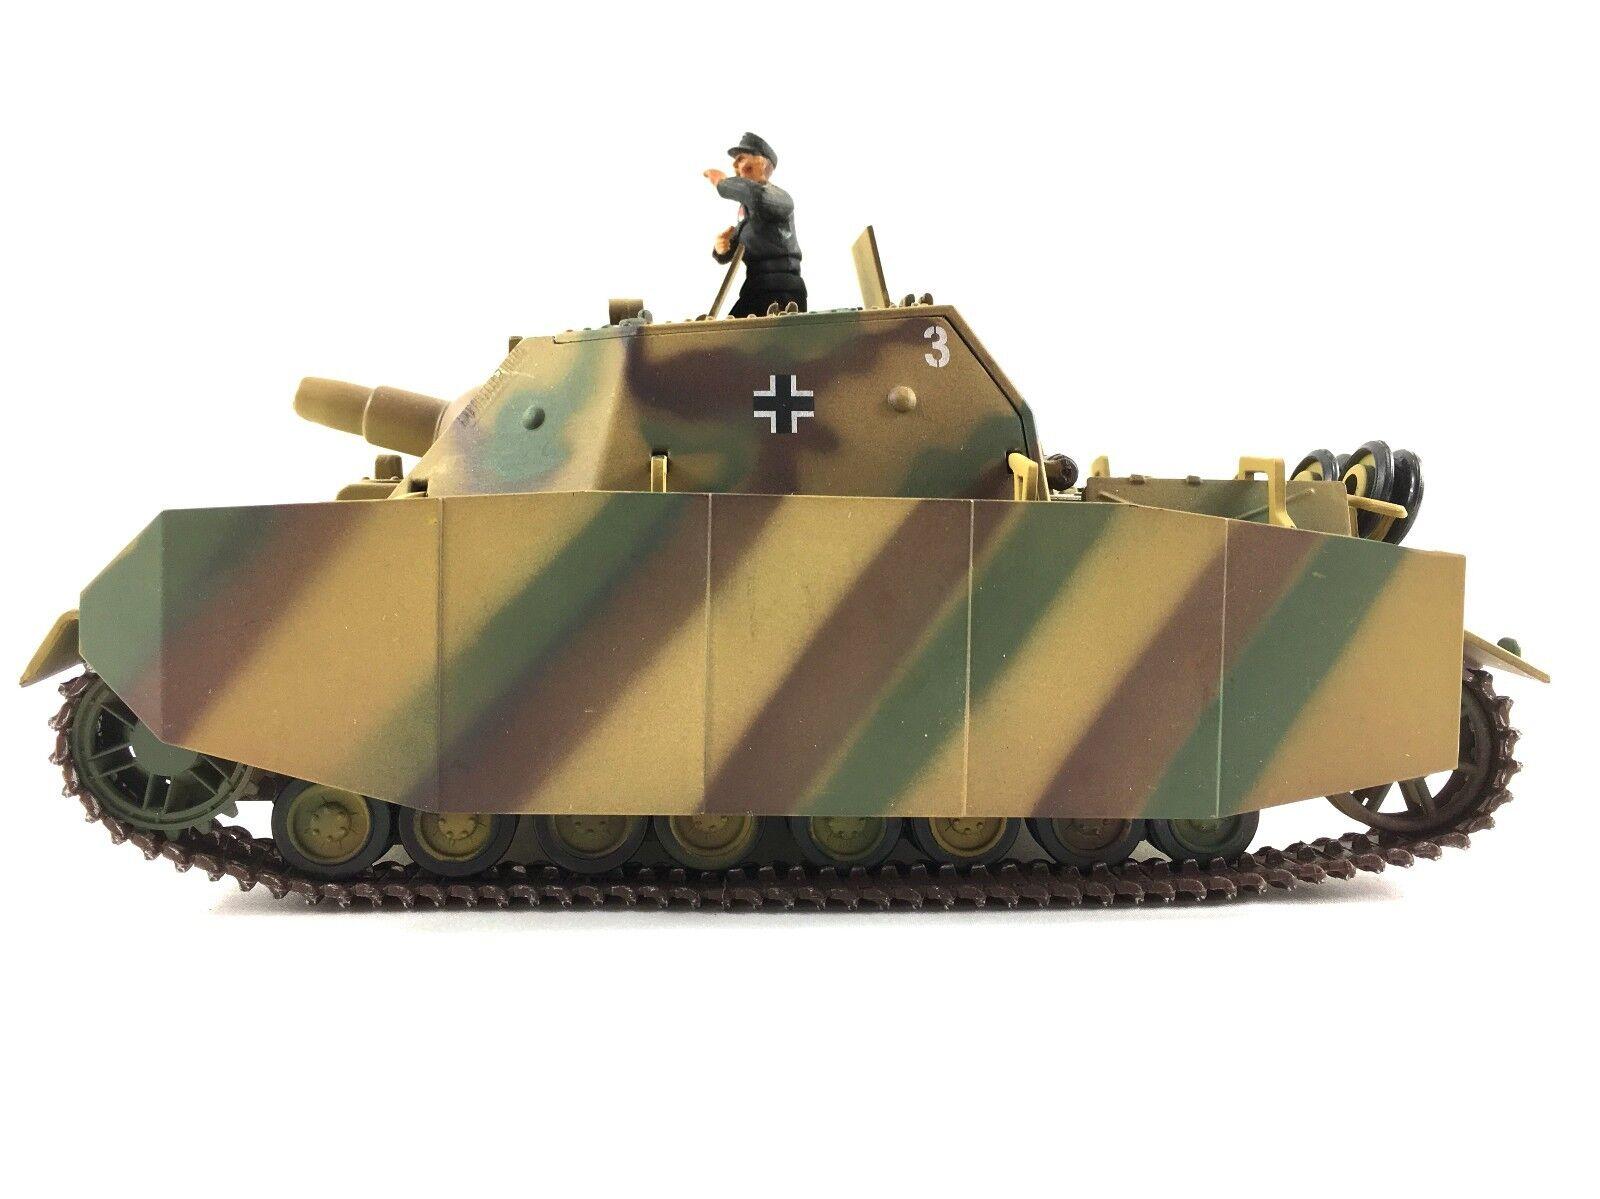 1 32 Diecast 21st Century Toys Ultimate Soldier German Sturmpanzer Brummbar Tank